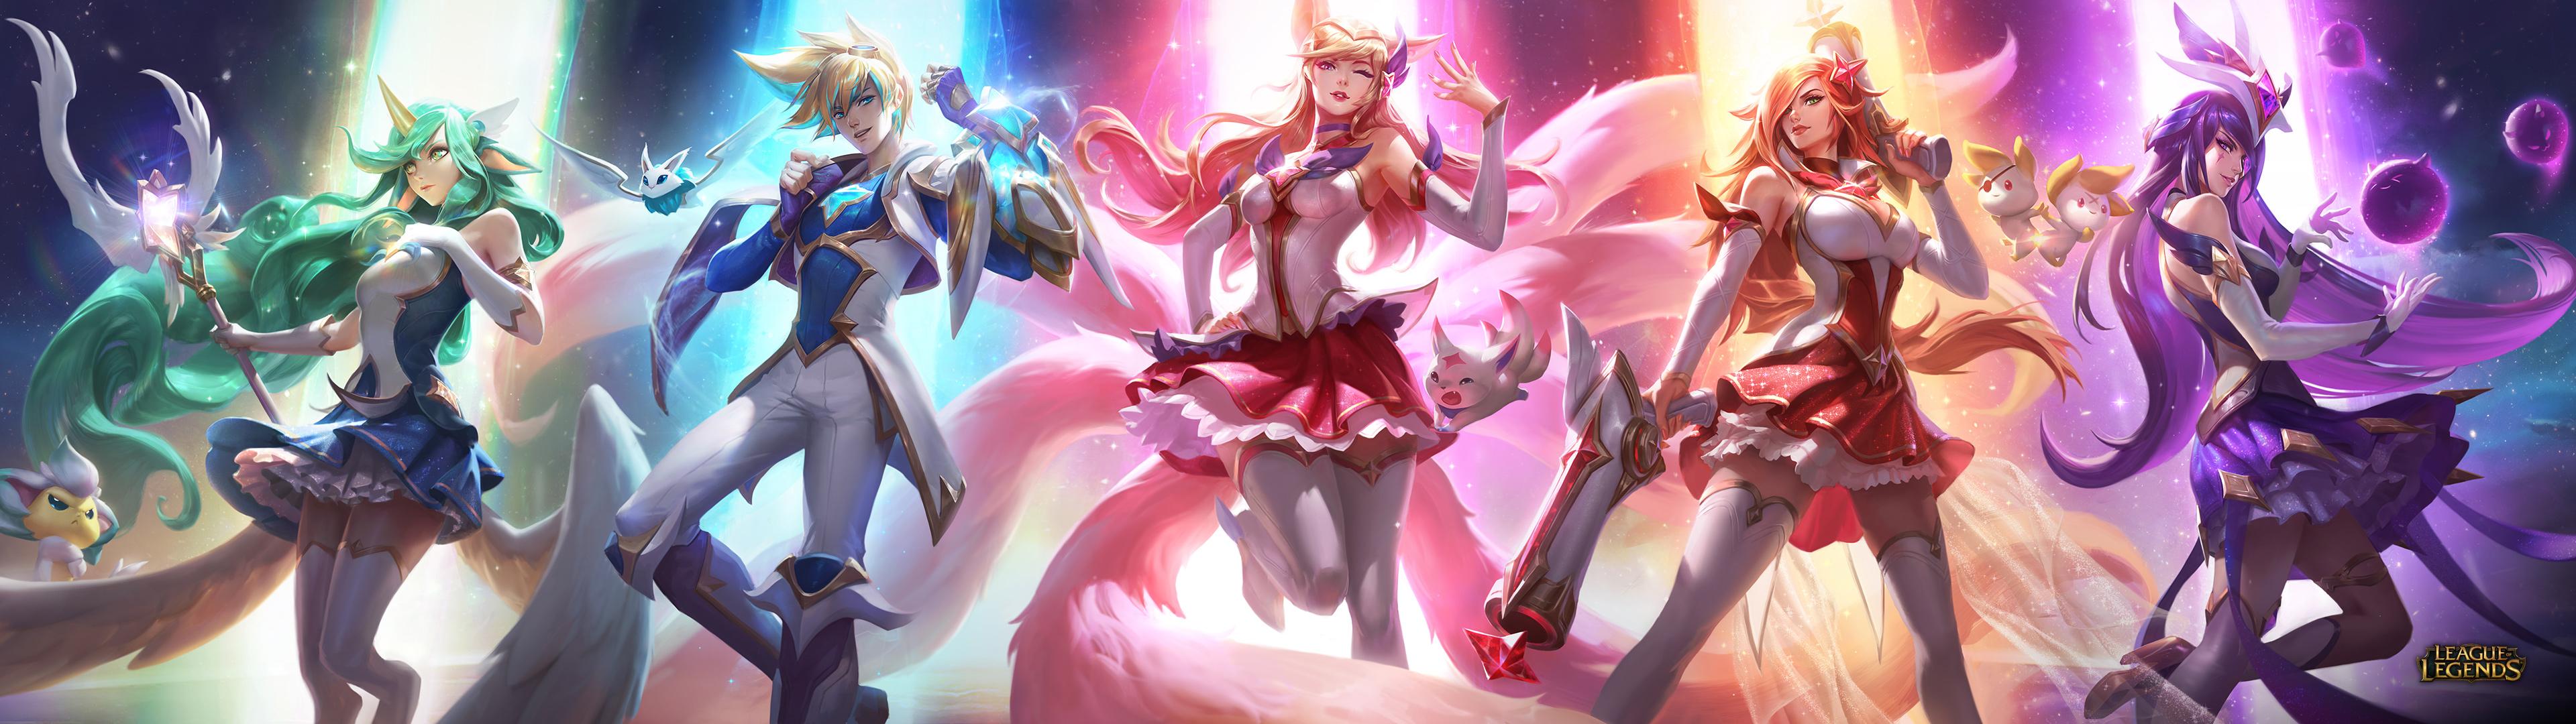 Wallpaper Soraka League Of Legends Summoner S Rift League Of